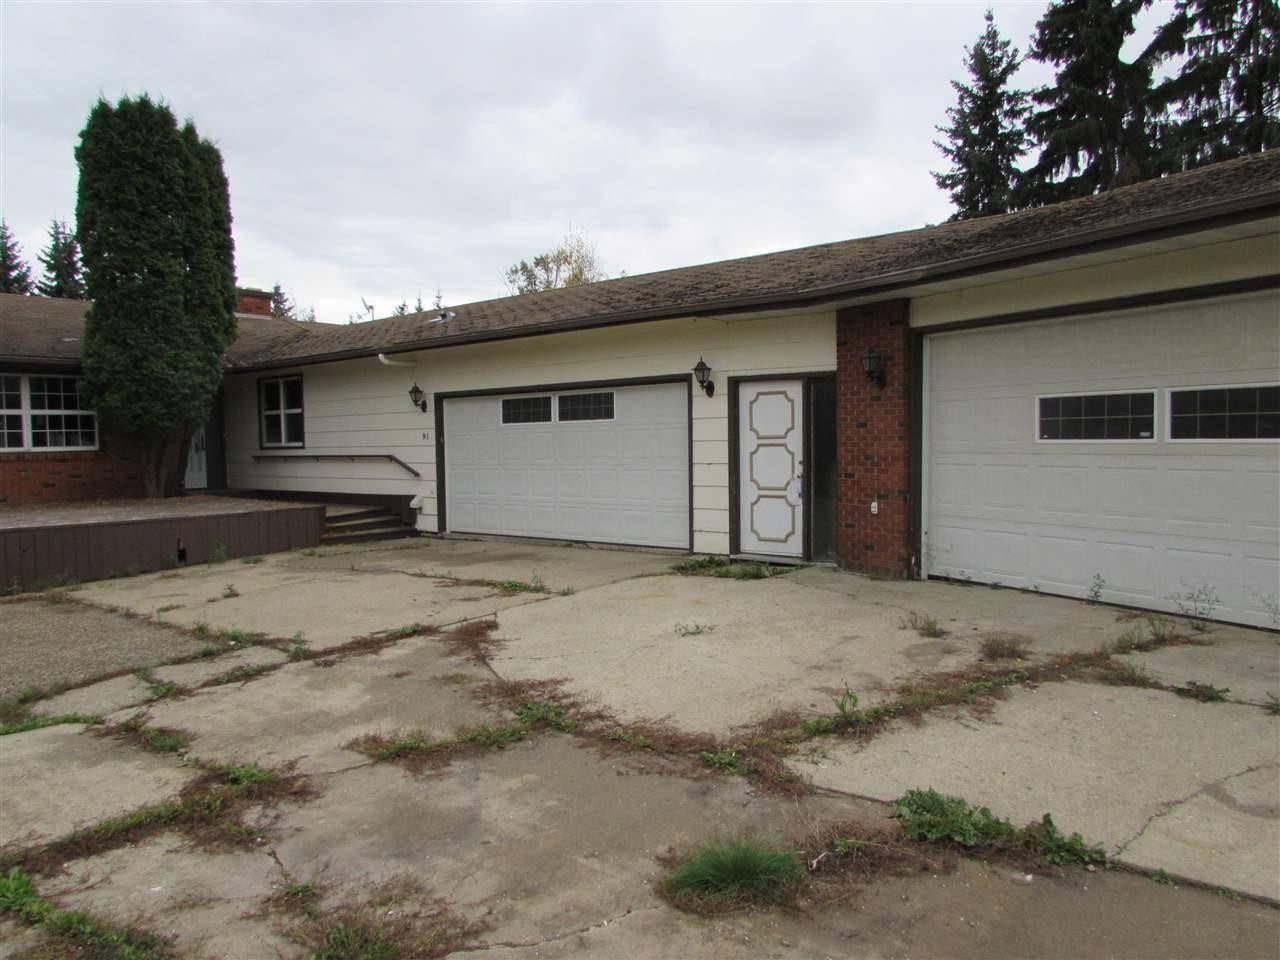 House for sale at 91 Shultz Cres Rural Sturgeon County Alberta - MLS: E4182945